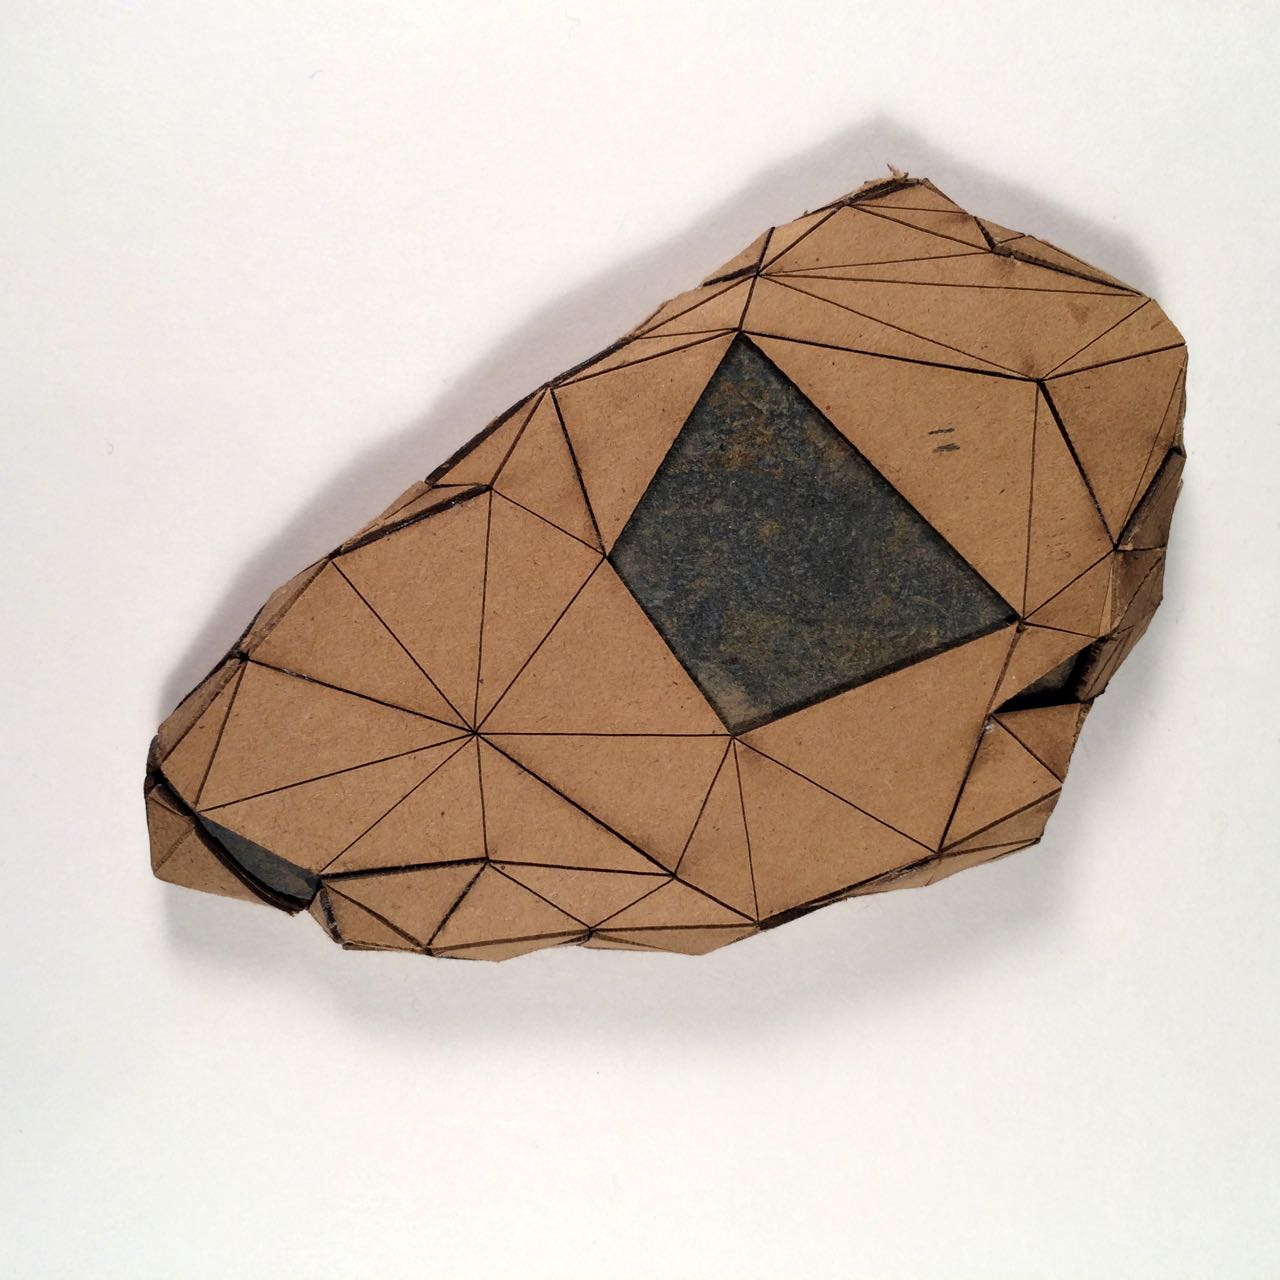 (Front view) 011 - Boxes For Rocks, 2012, laser cut cardboard, found rocks, glue, 13.5cm x 8.5cm x 1.5cm (flat), 250 CAD